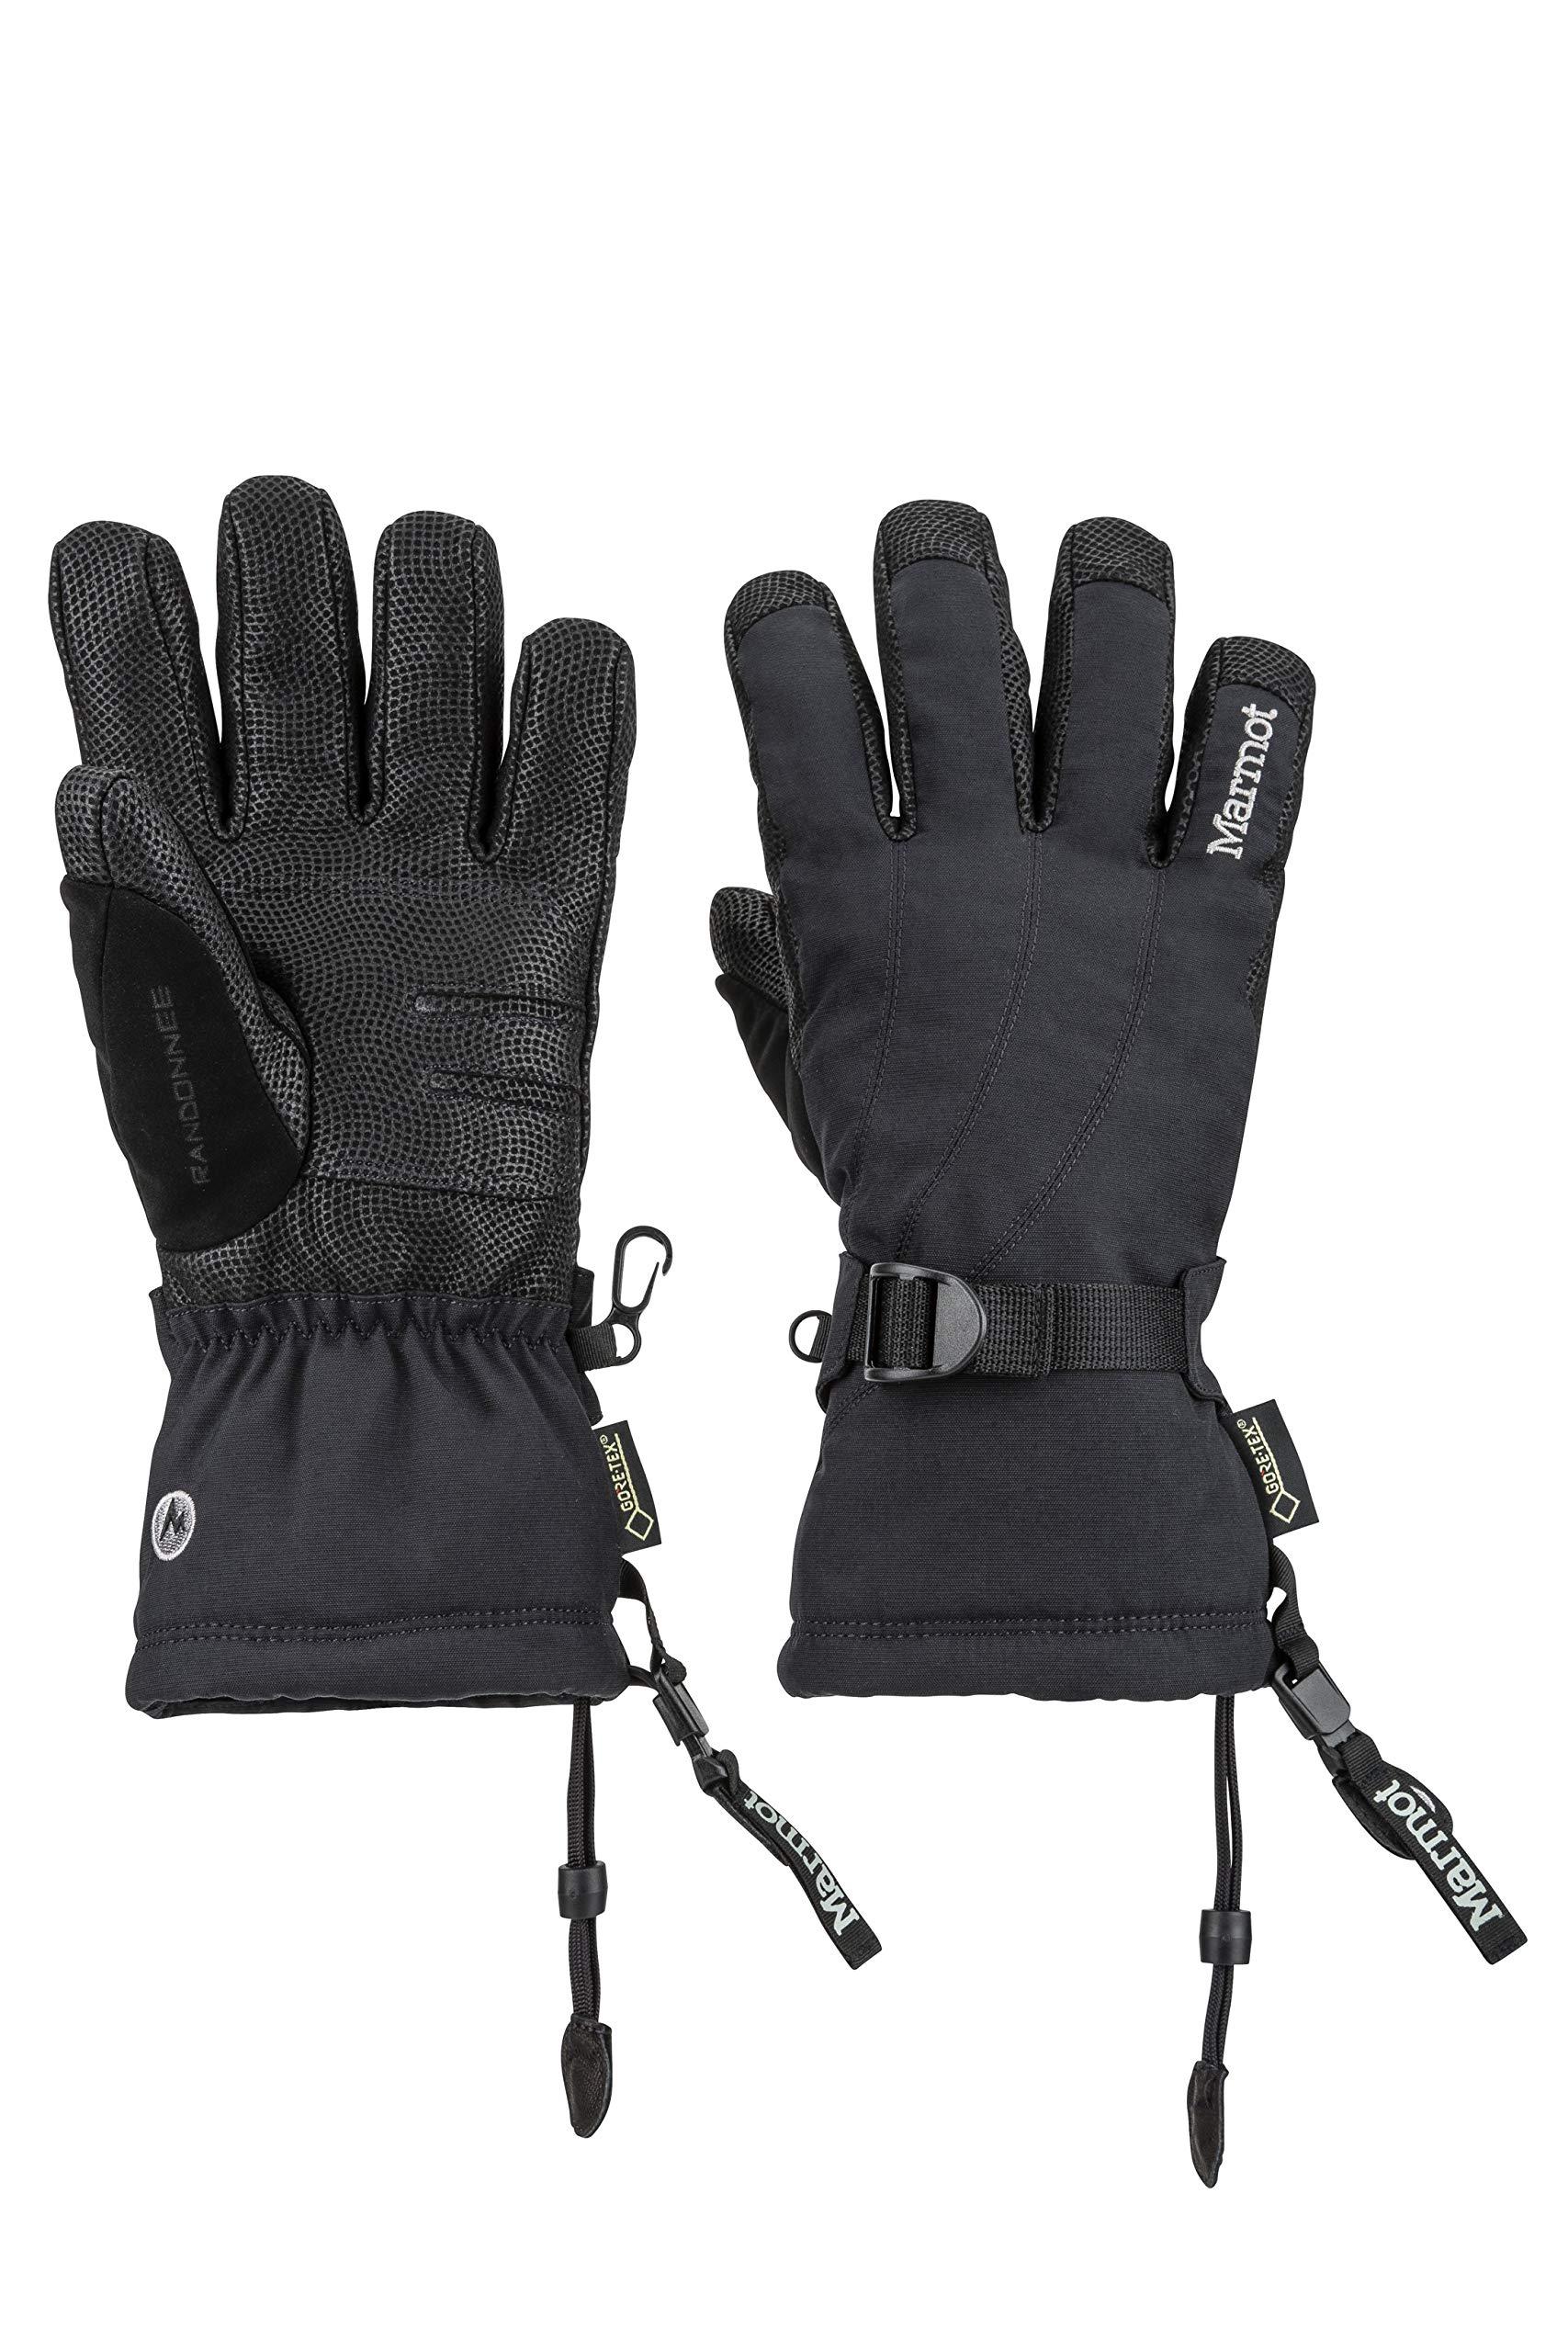 Marmot Women's Randonnee Glove, Large, Black